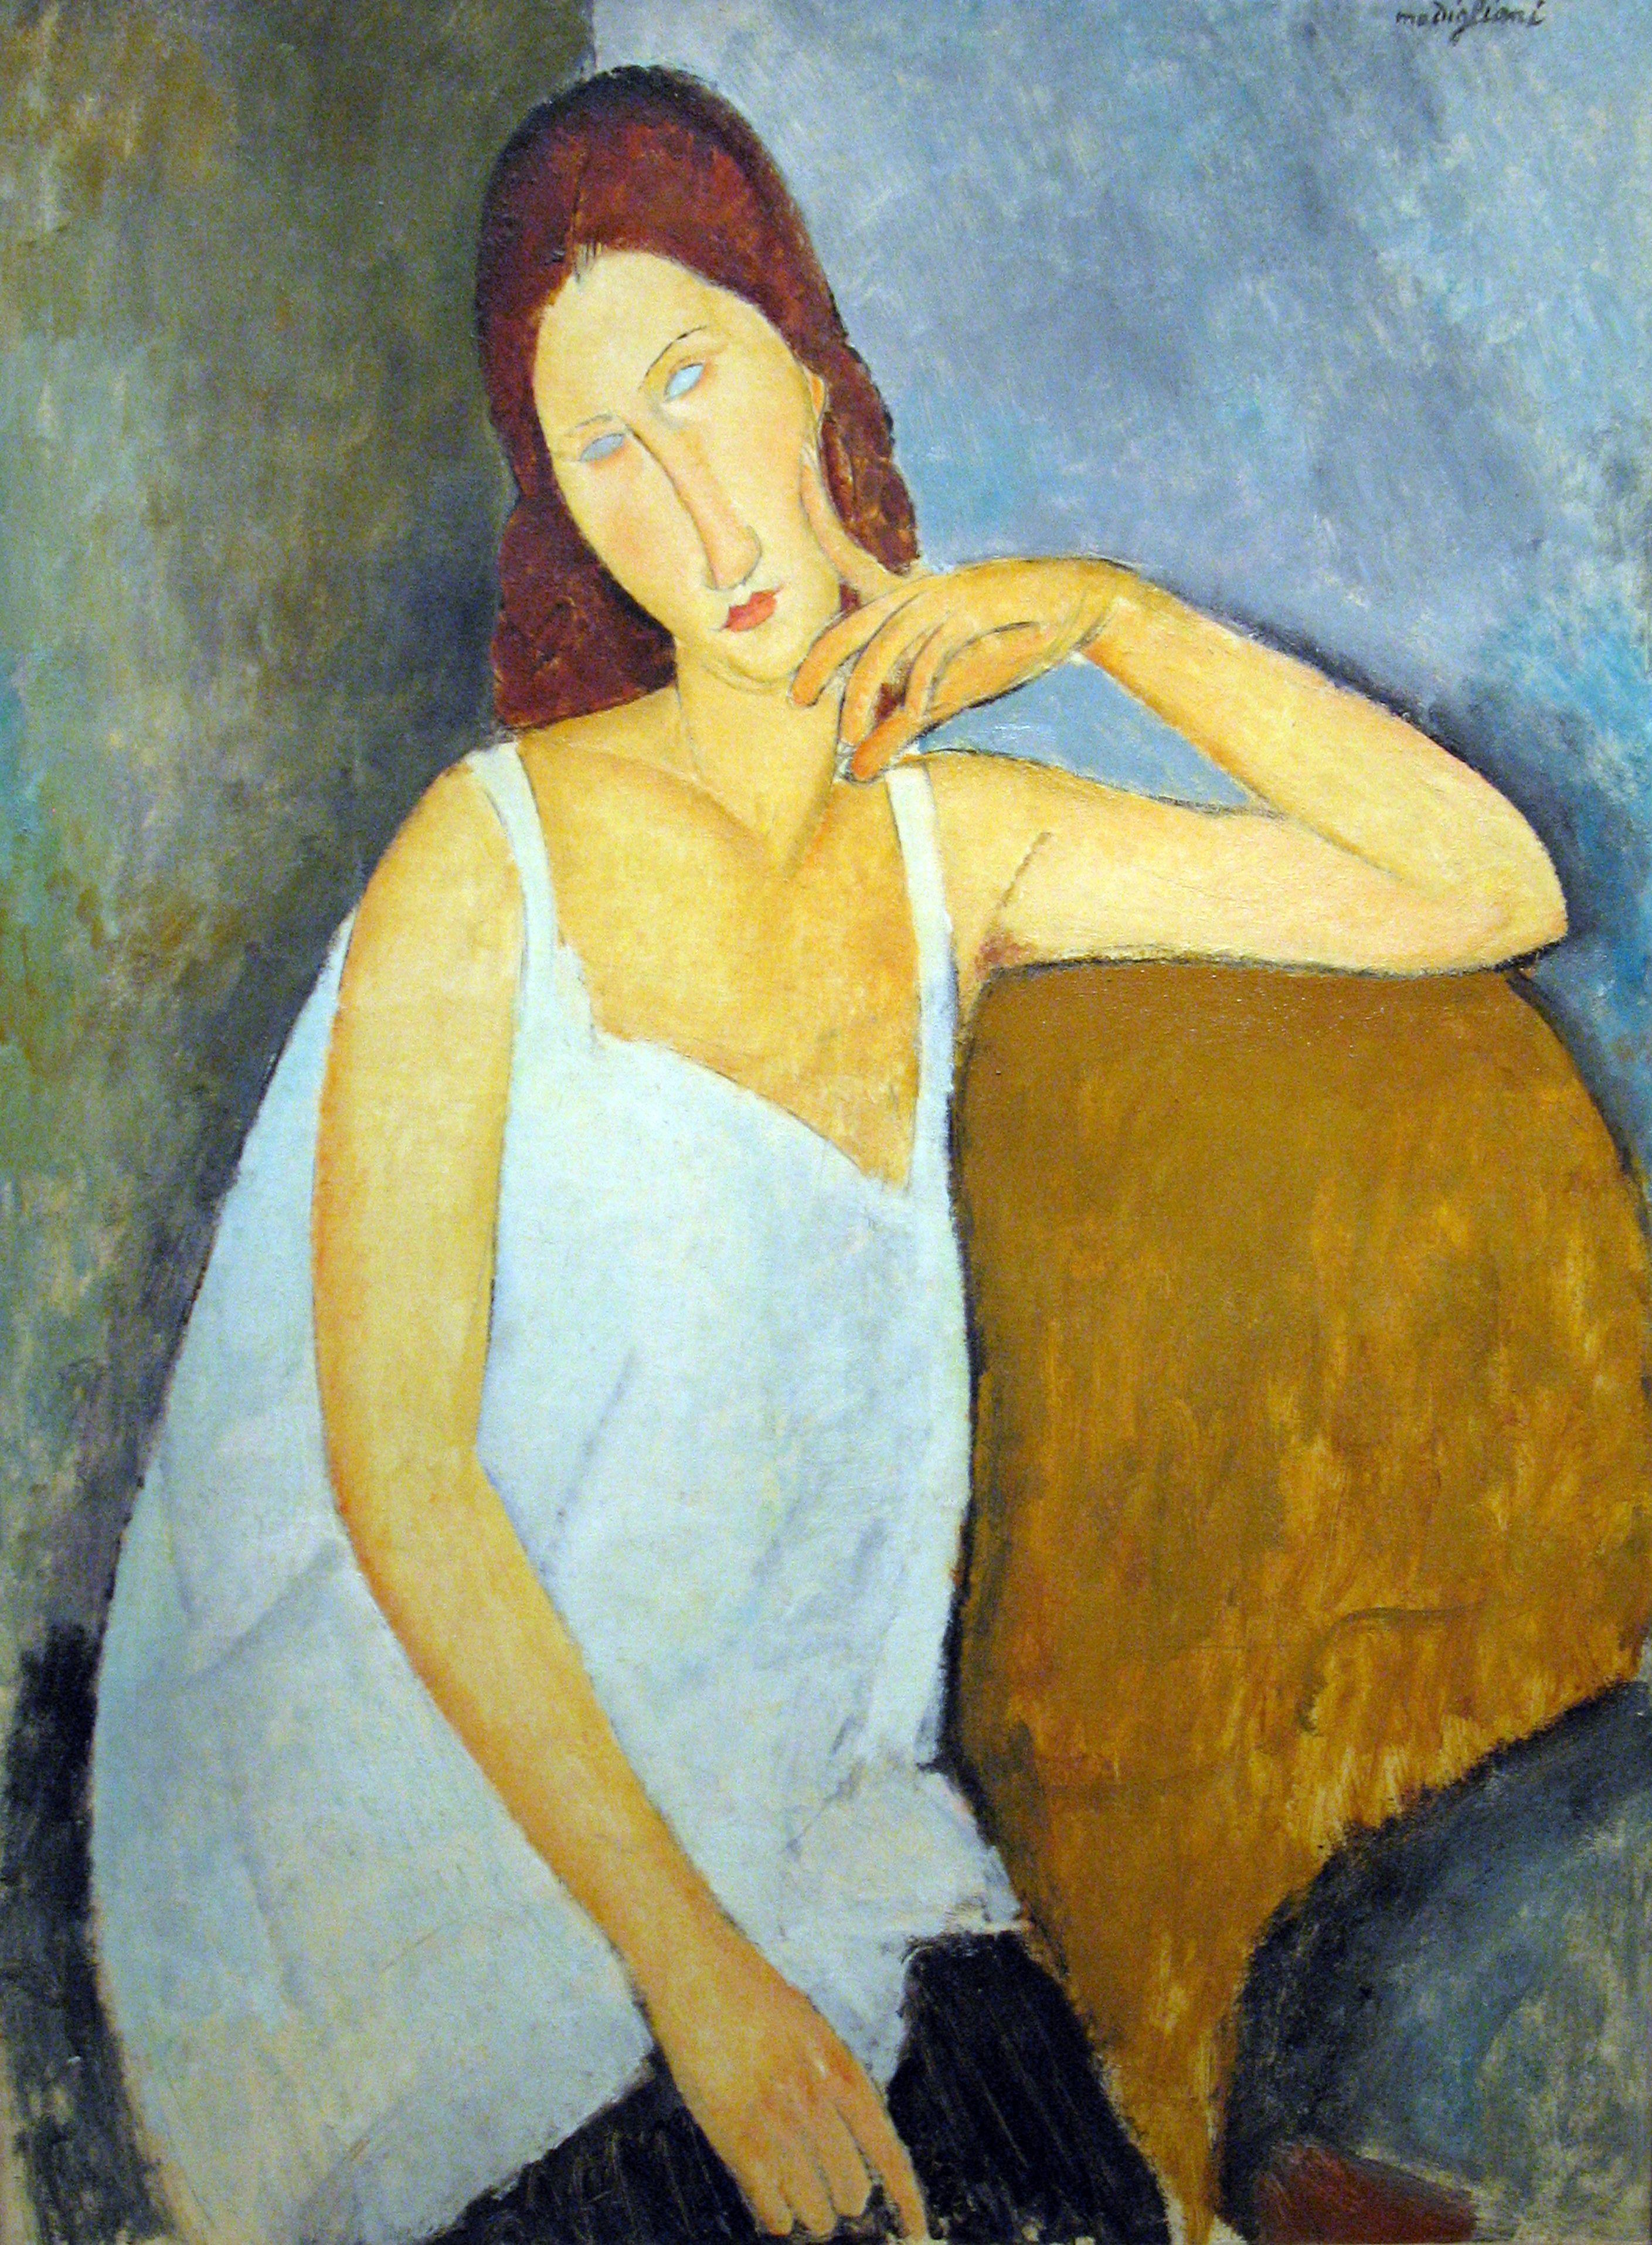 Leopold Zborowski 1918 Painting | Amedeo Modigliani Oil